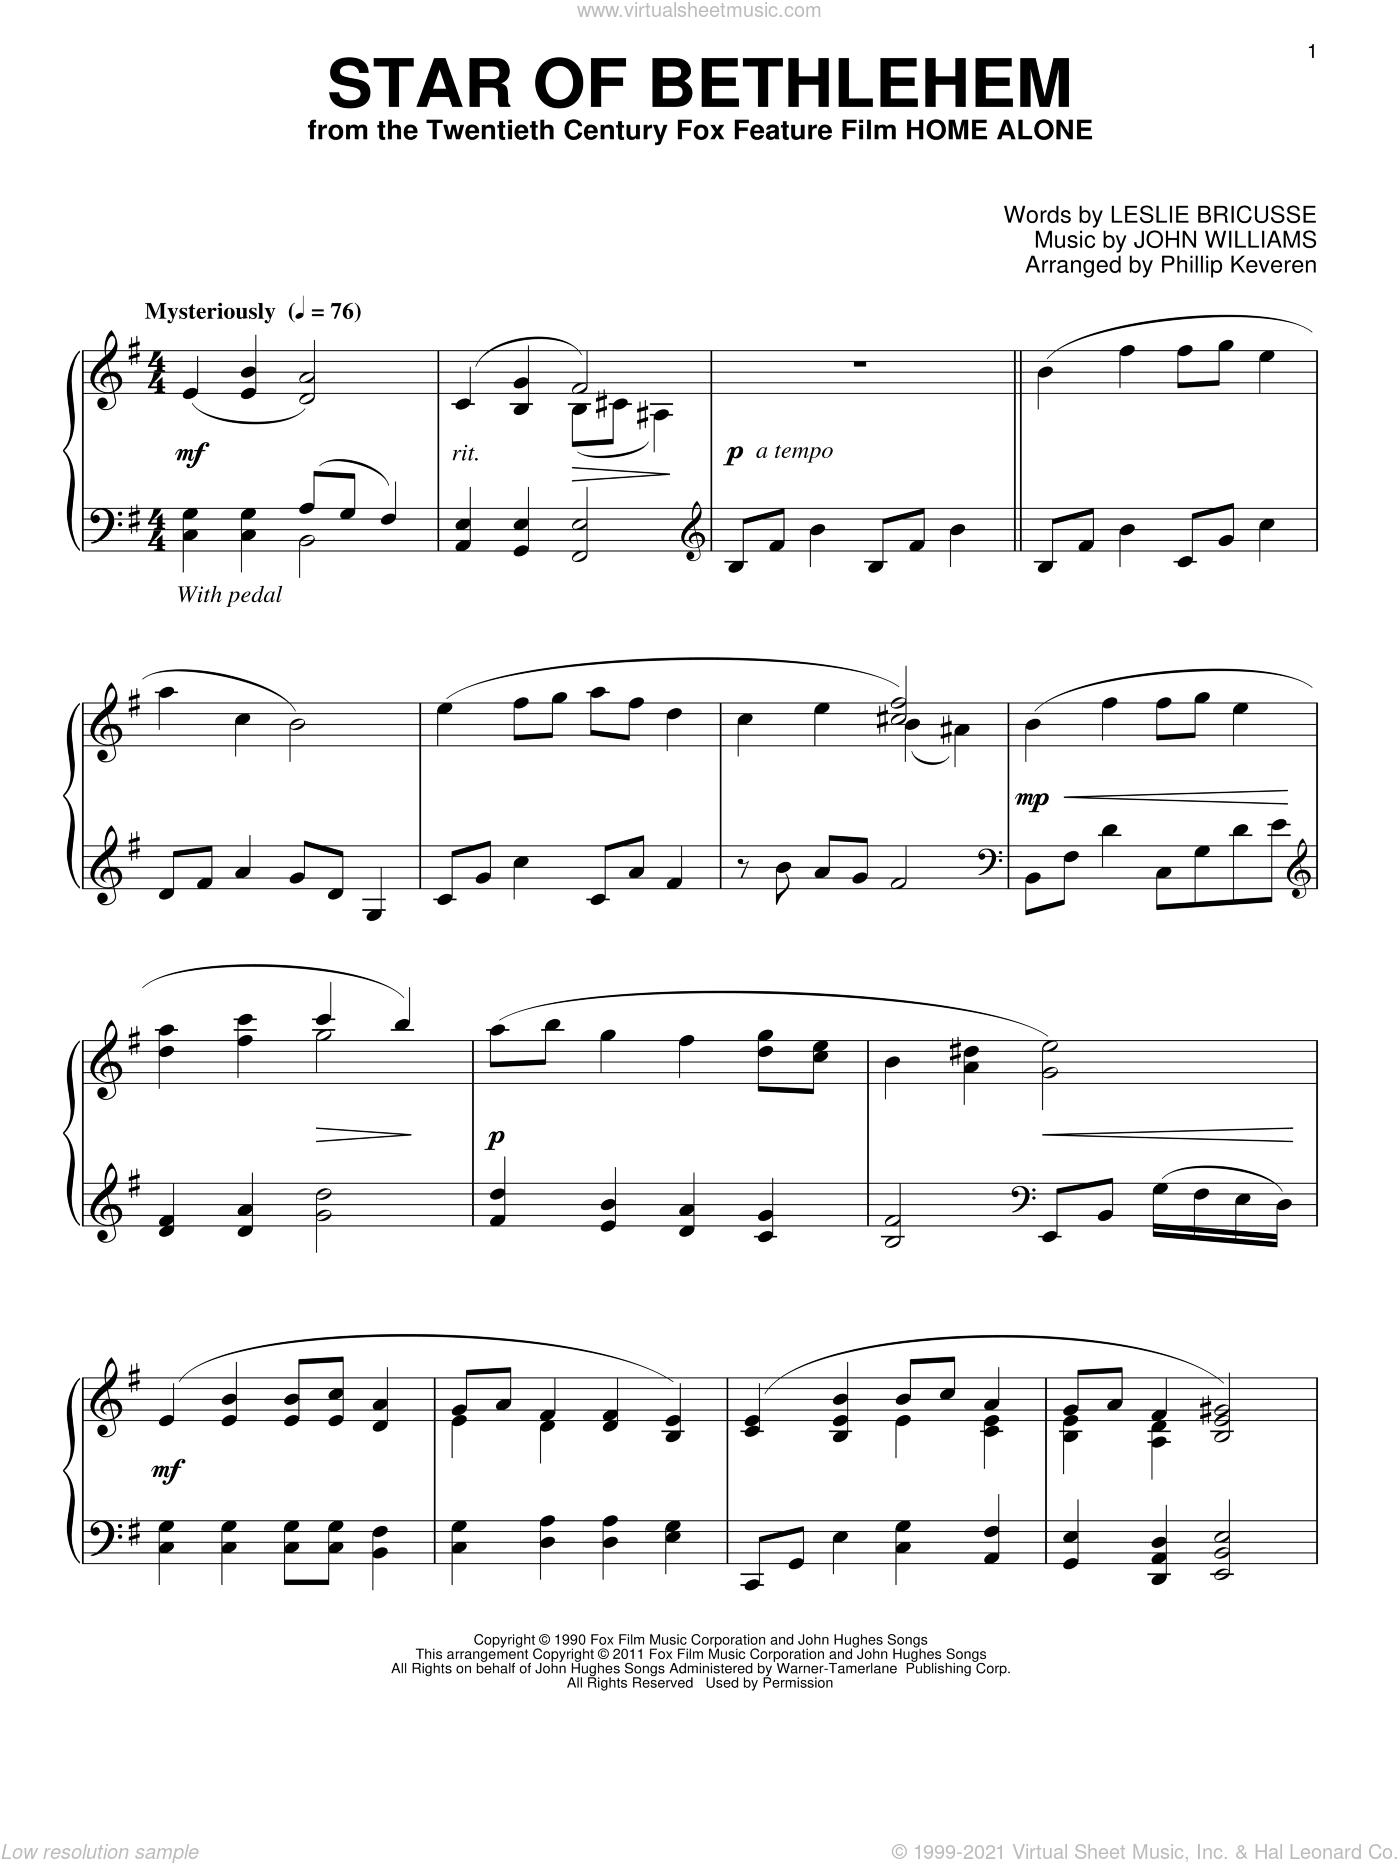 Star Of Bethlehem sheet music for piano solo by Leslie Bricusse, Phillip Keveren and John Williams, intermediate skill level